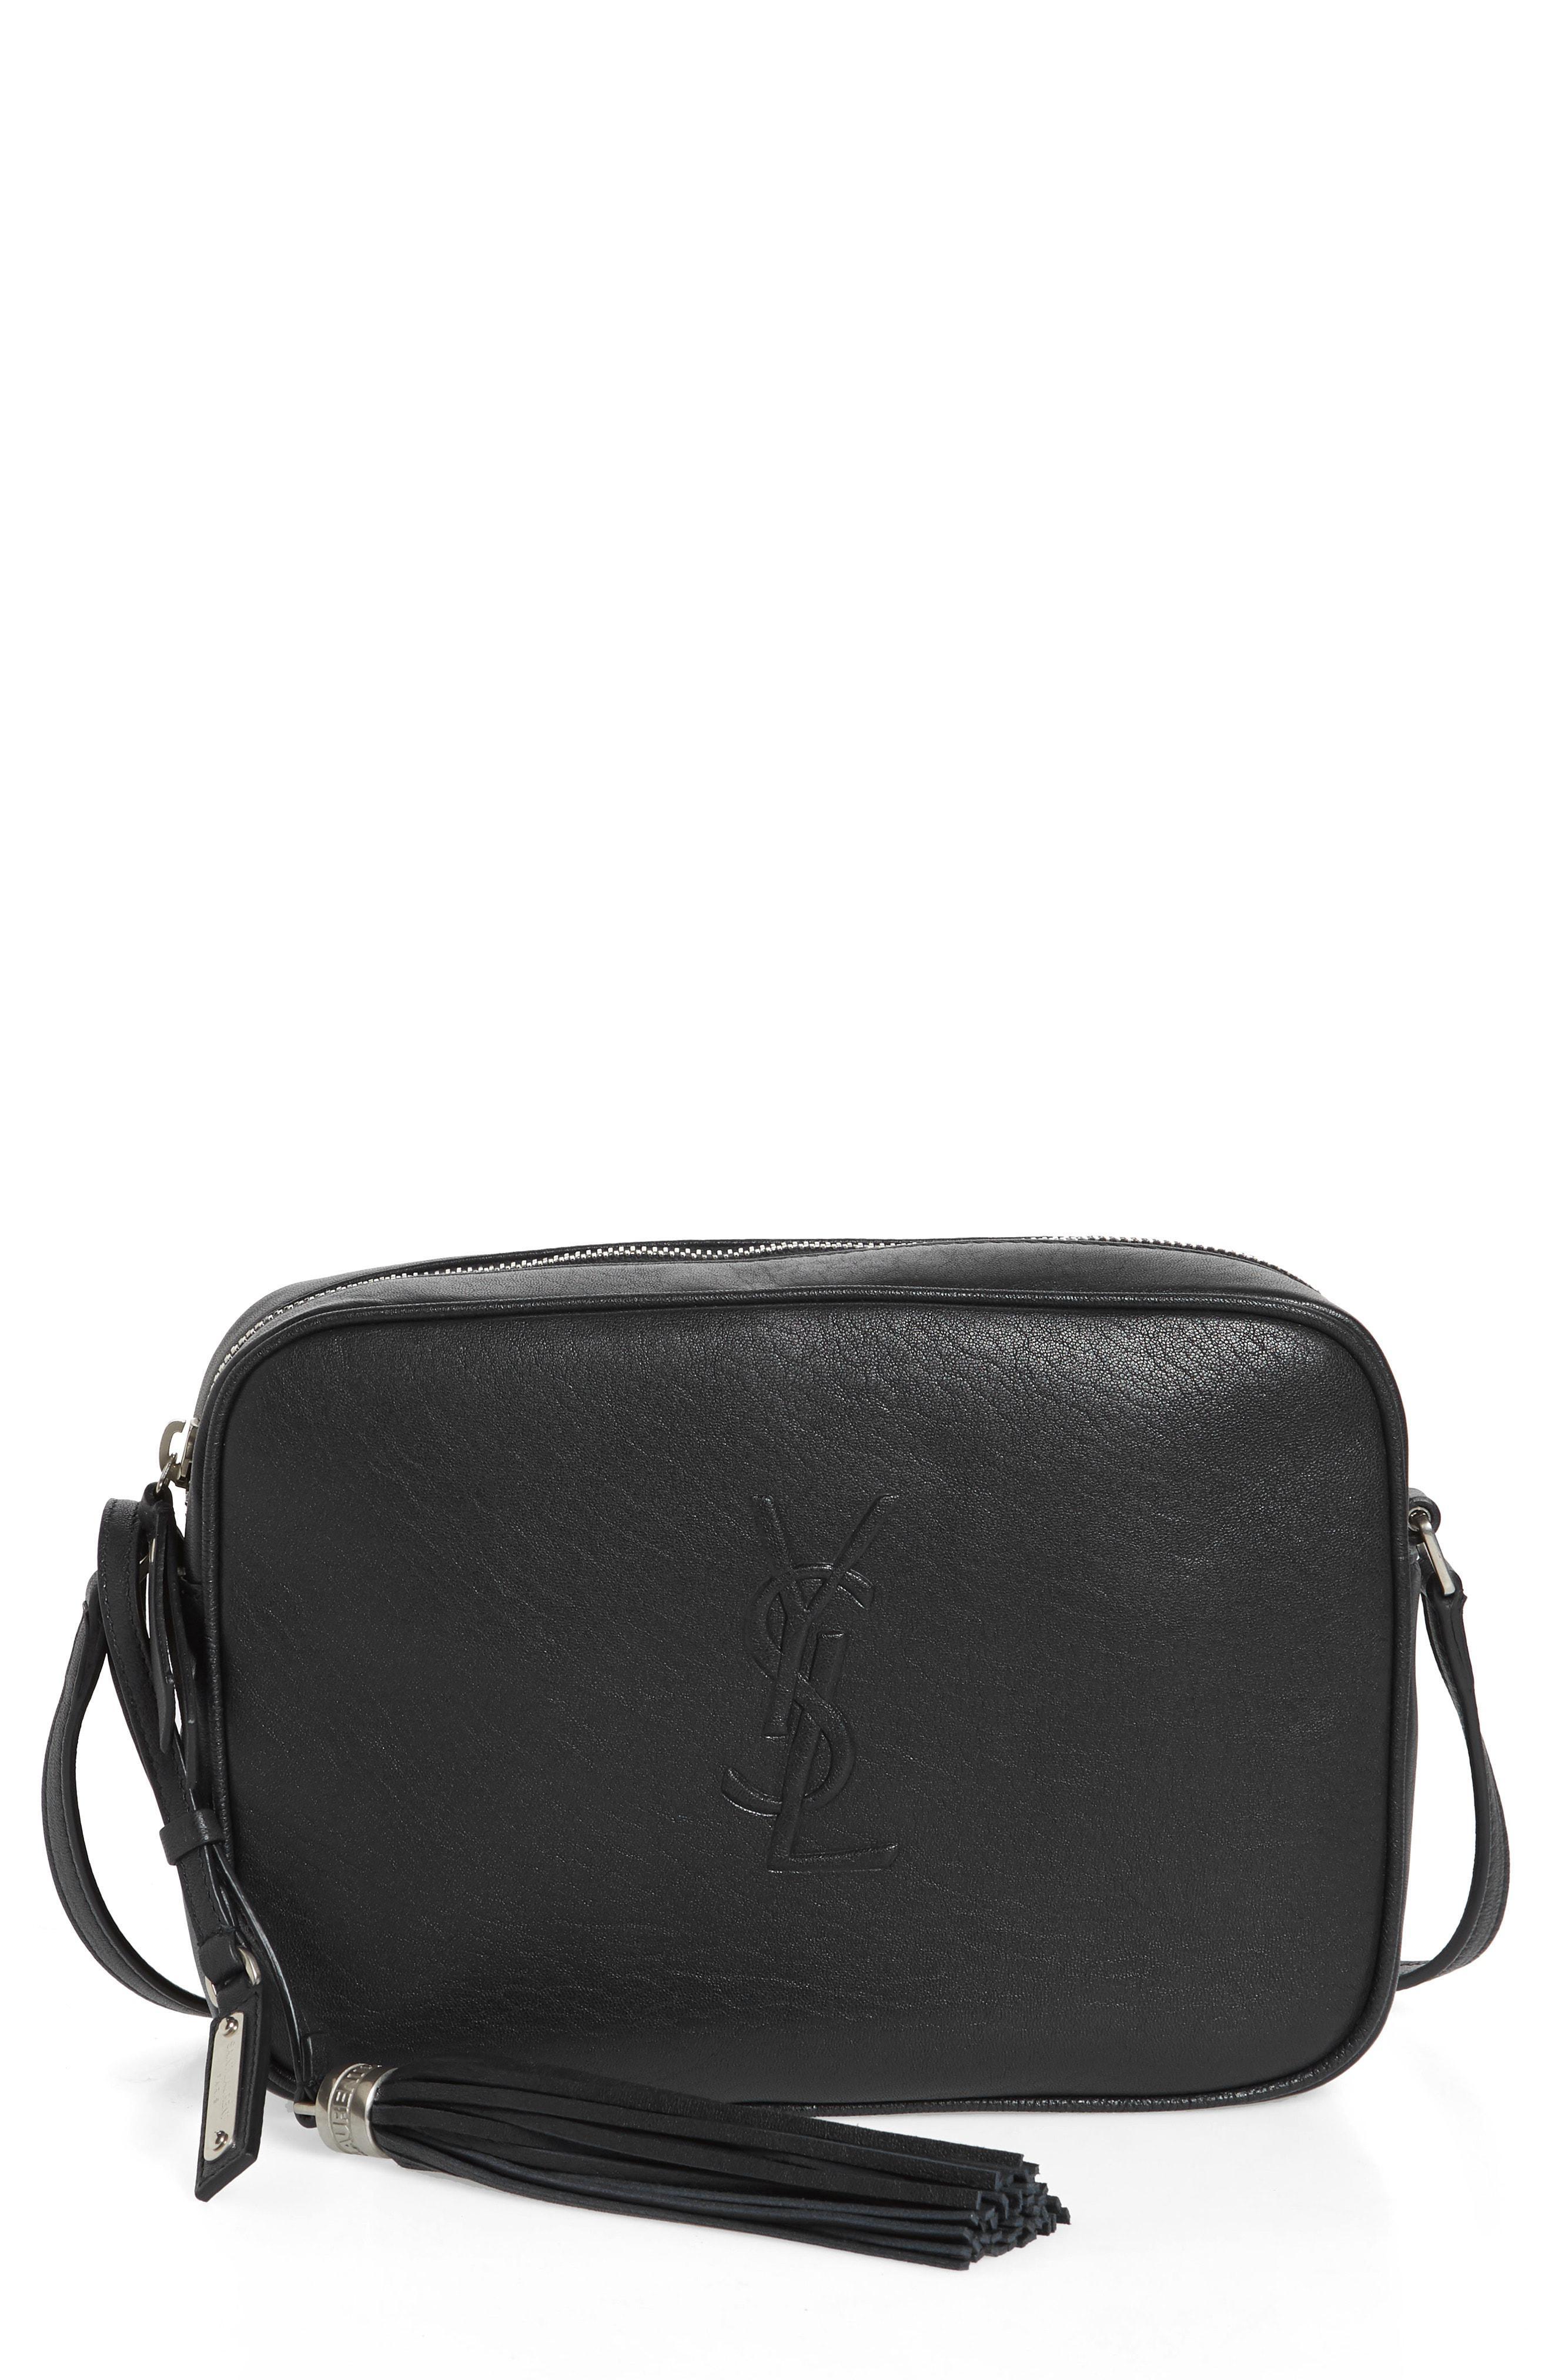 5c666be18bc Saint Laurent. Women s Small Mono Leather Camera Bag -